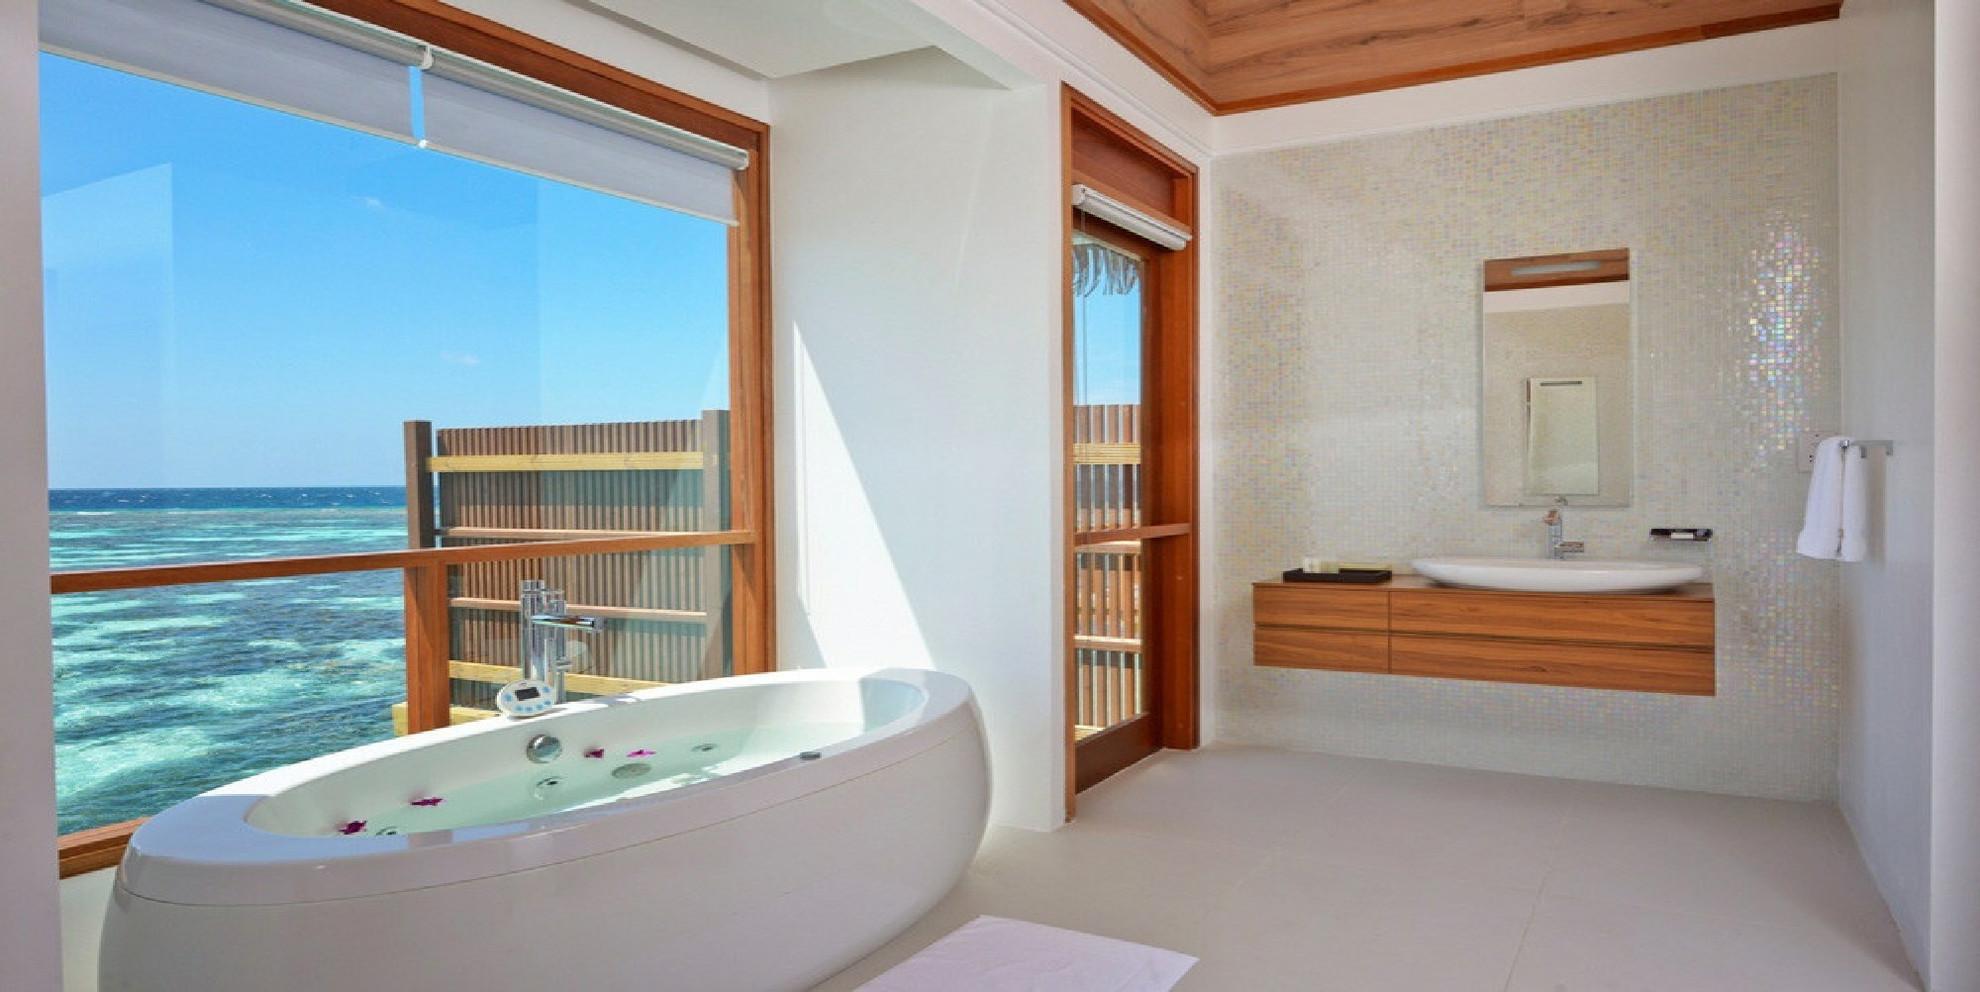 Idee Per Interni Moderni : Ambiente bagno idee per interni moderni floornature